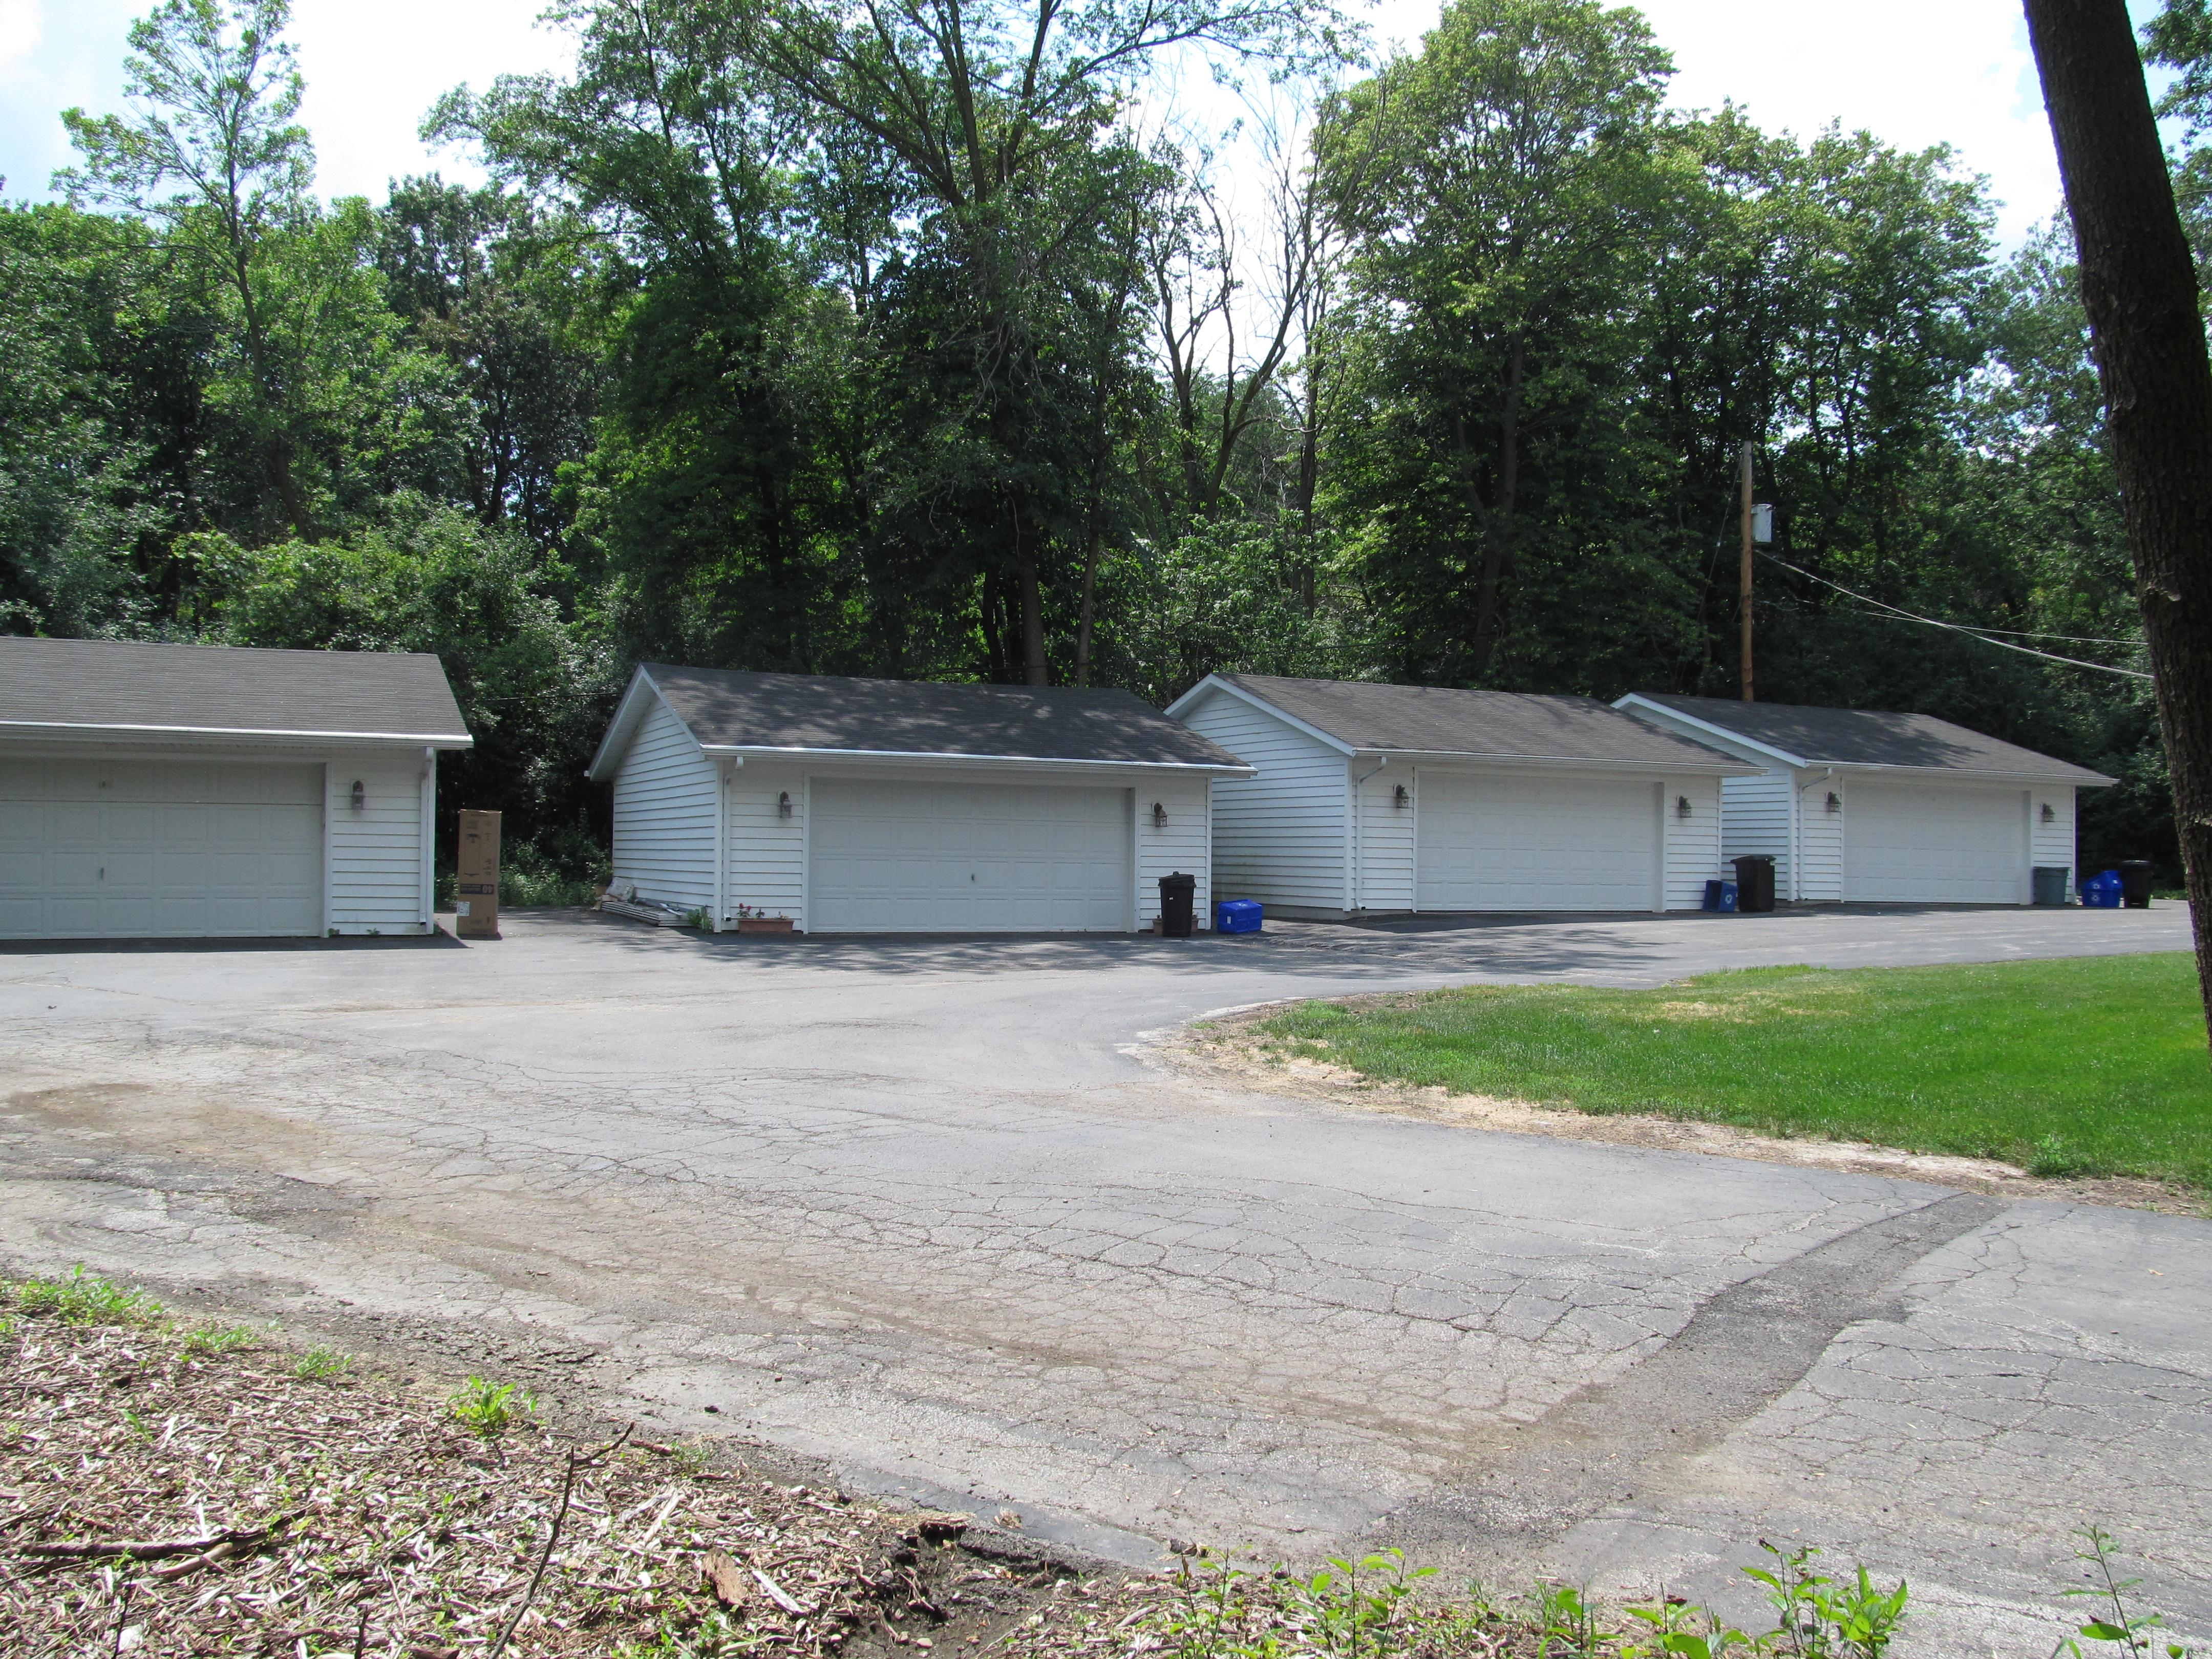 Marilyn East garages